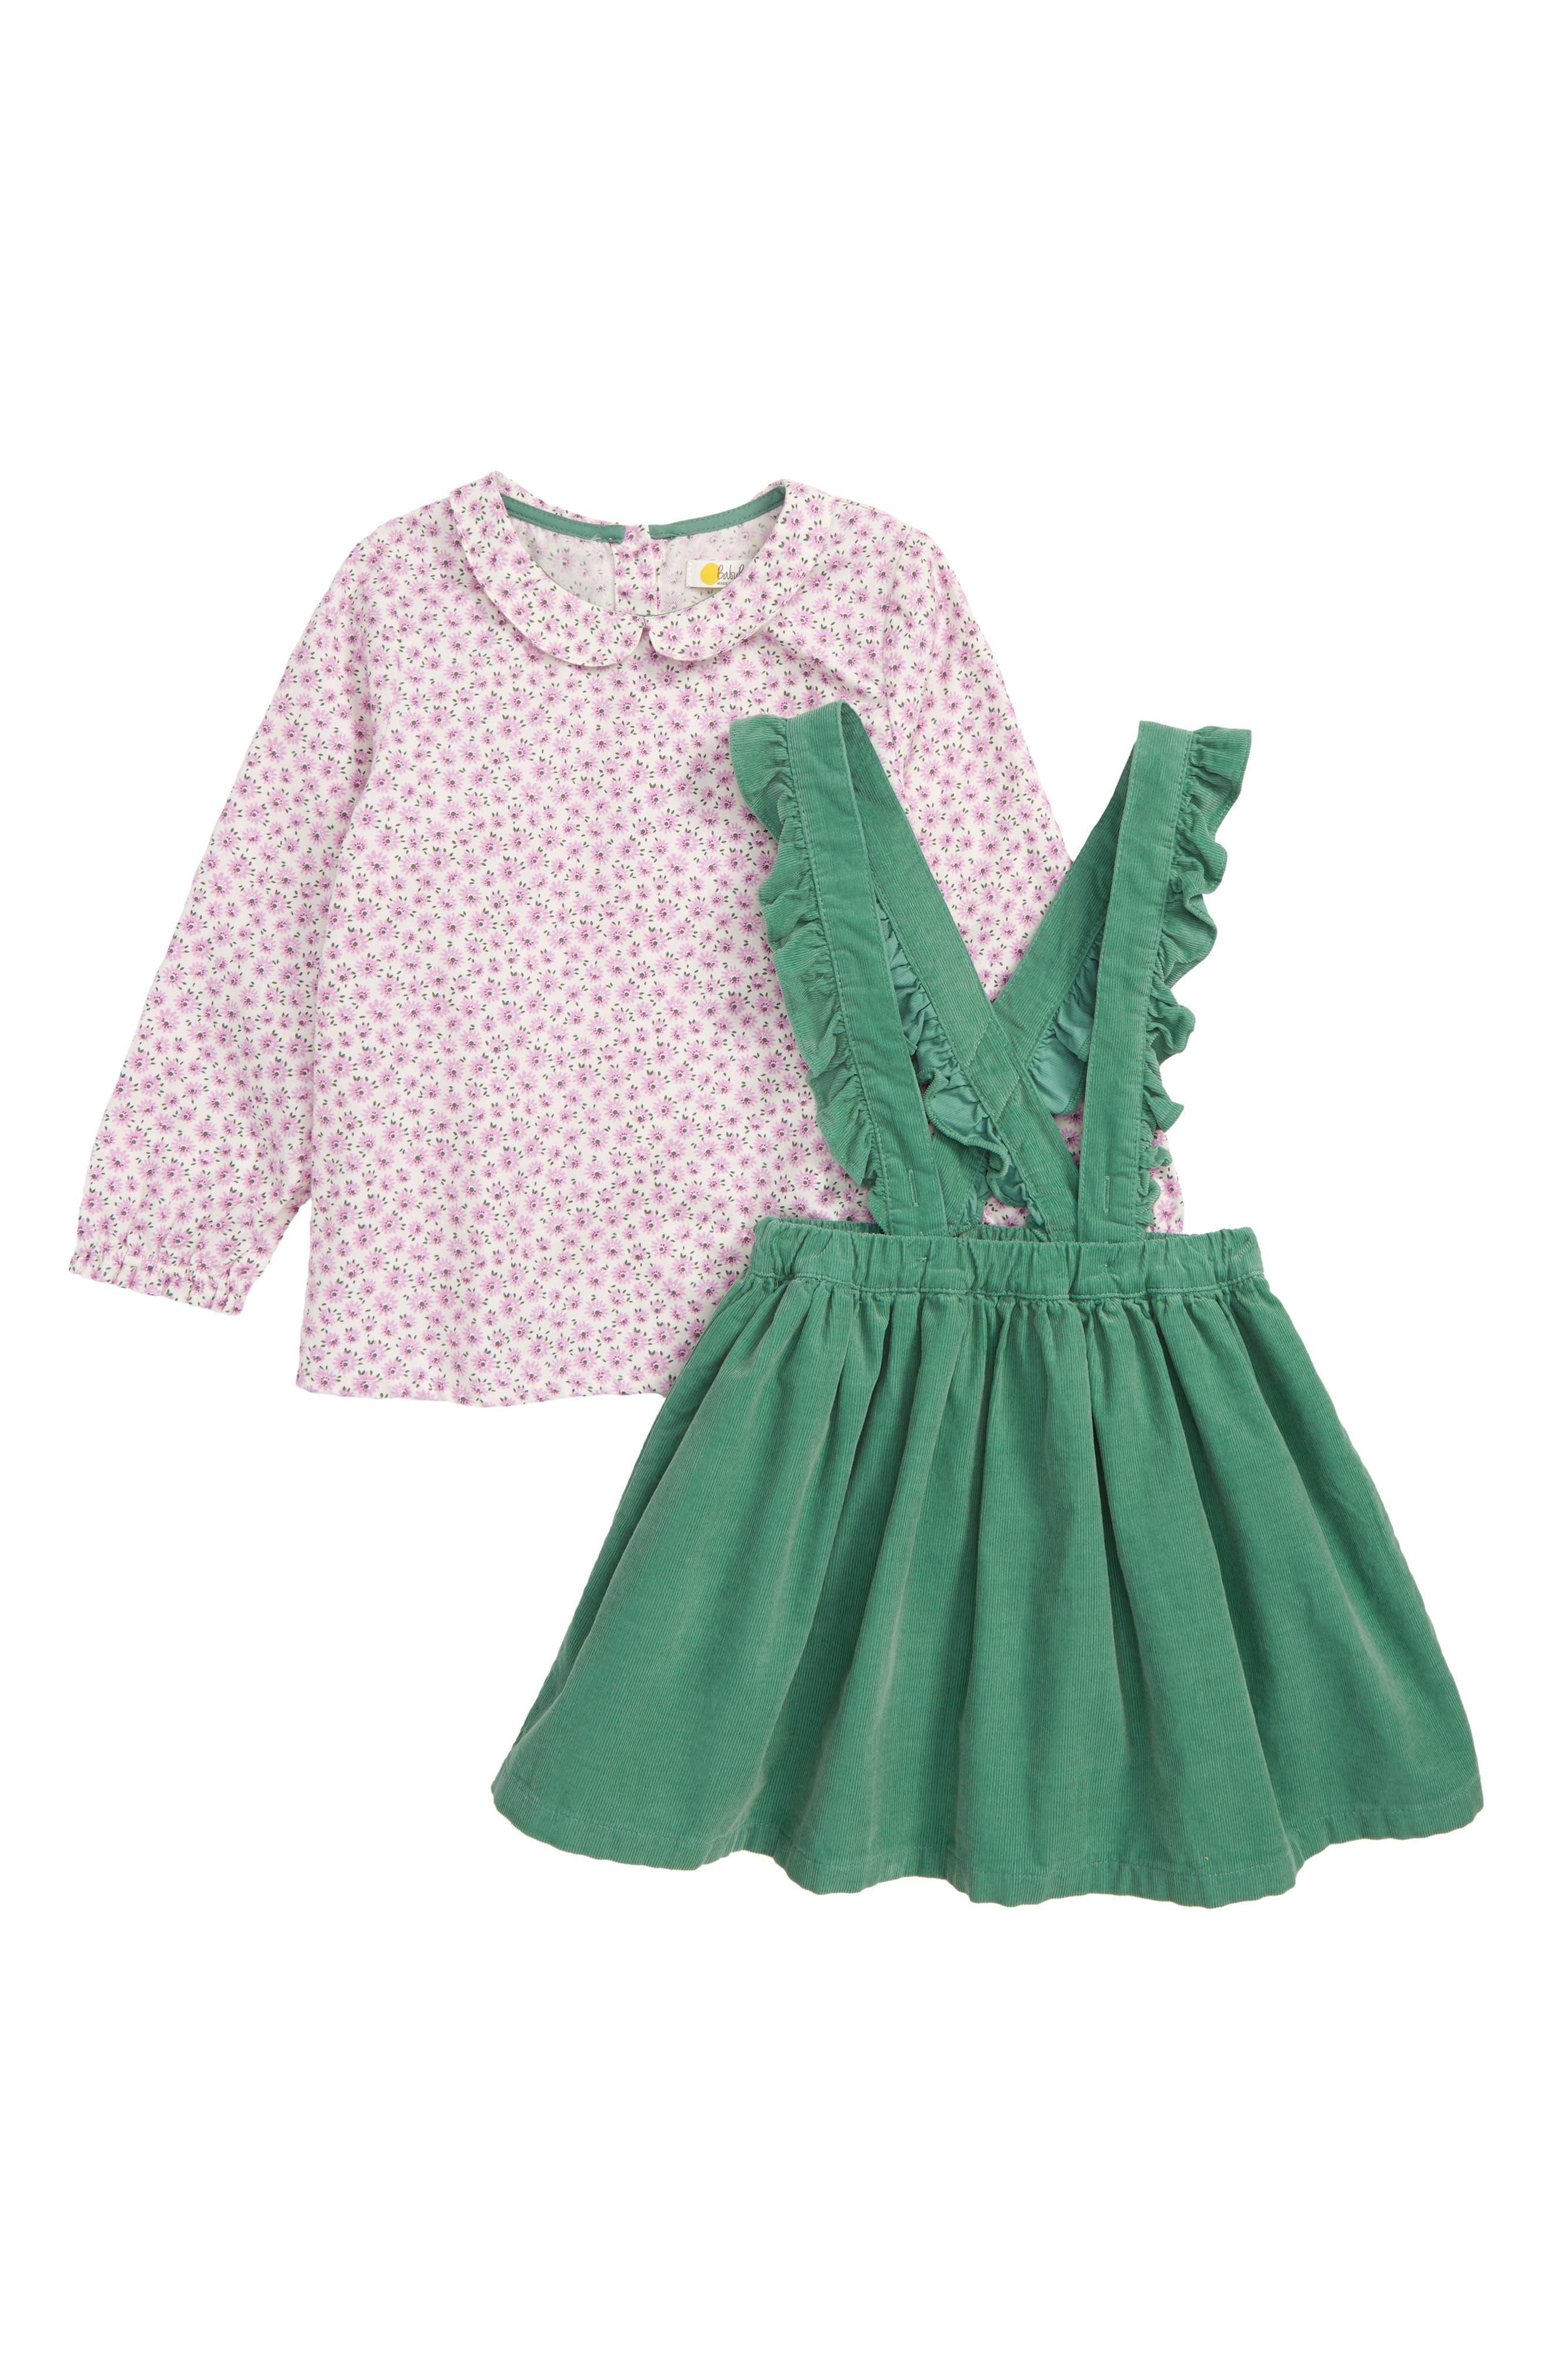 Nostalgic Print Top & Overall Skirt, Main, color, PRP LILAC PINK BLOSSOM